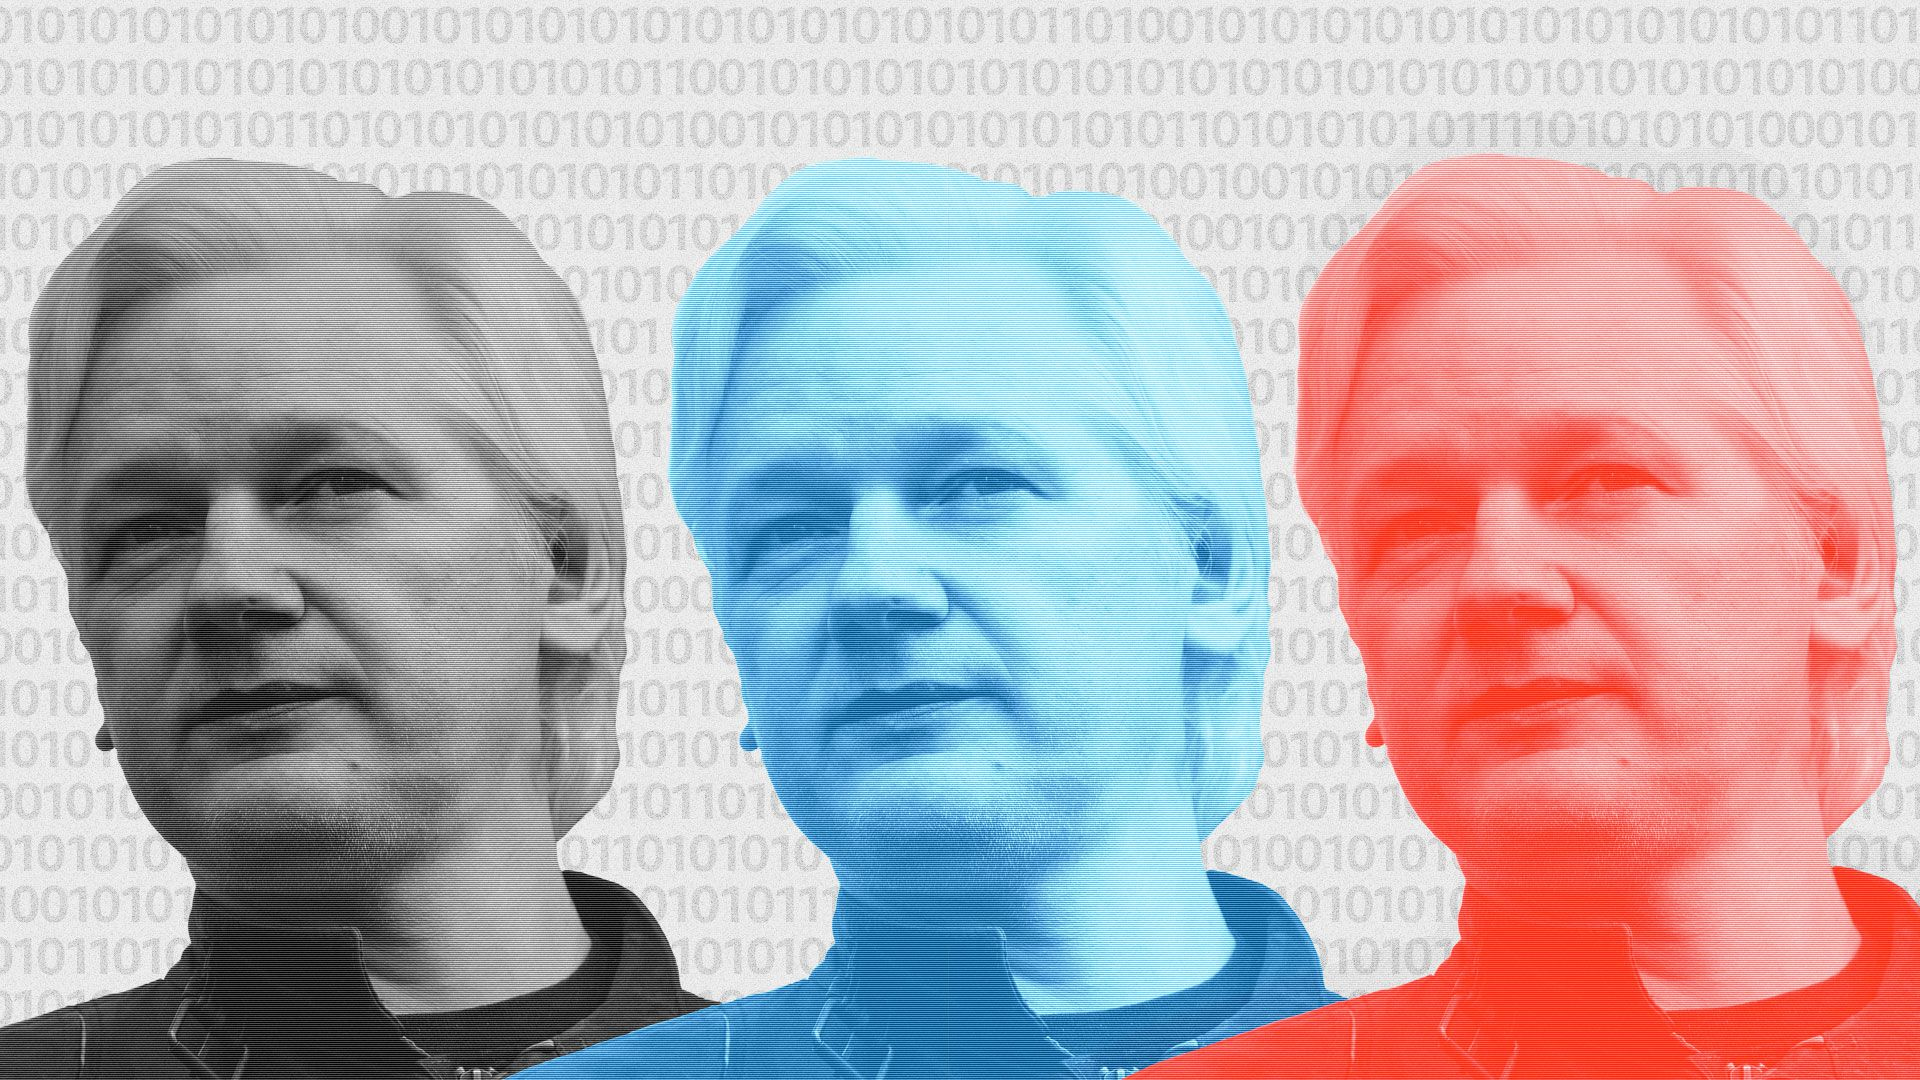 Illustration of Jullian Assange